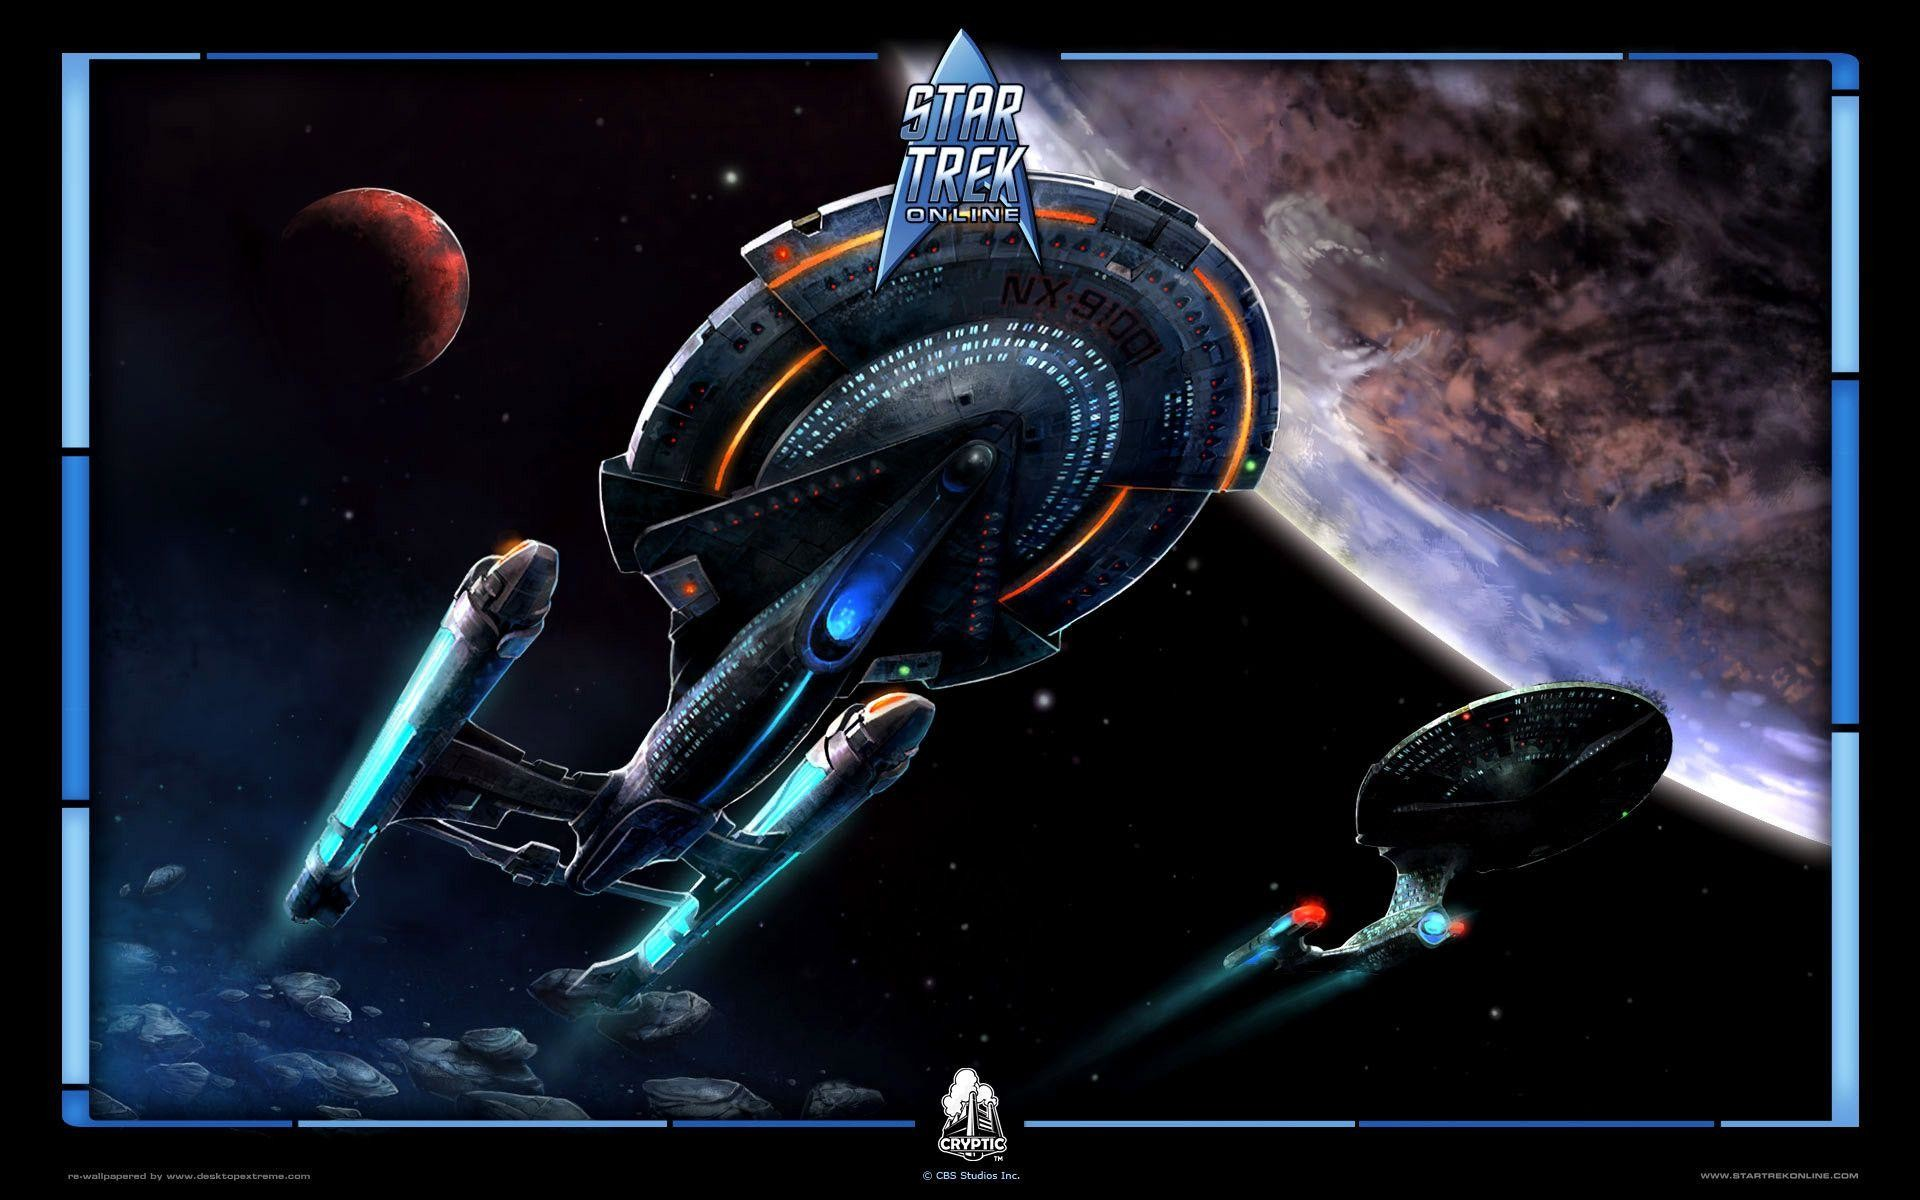 Star Trek Wallpaper – Full HD wallpaper search